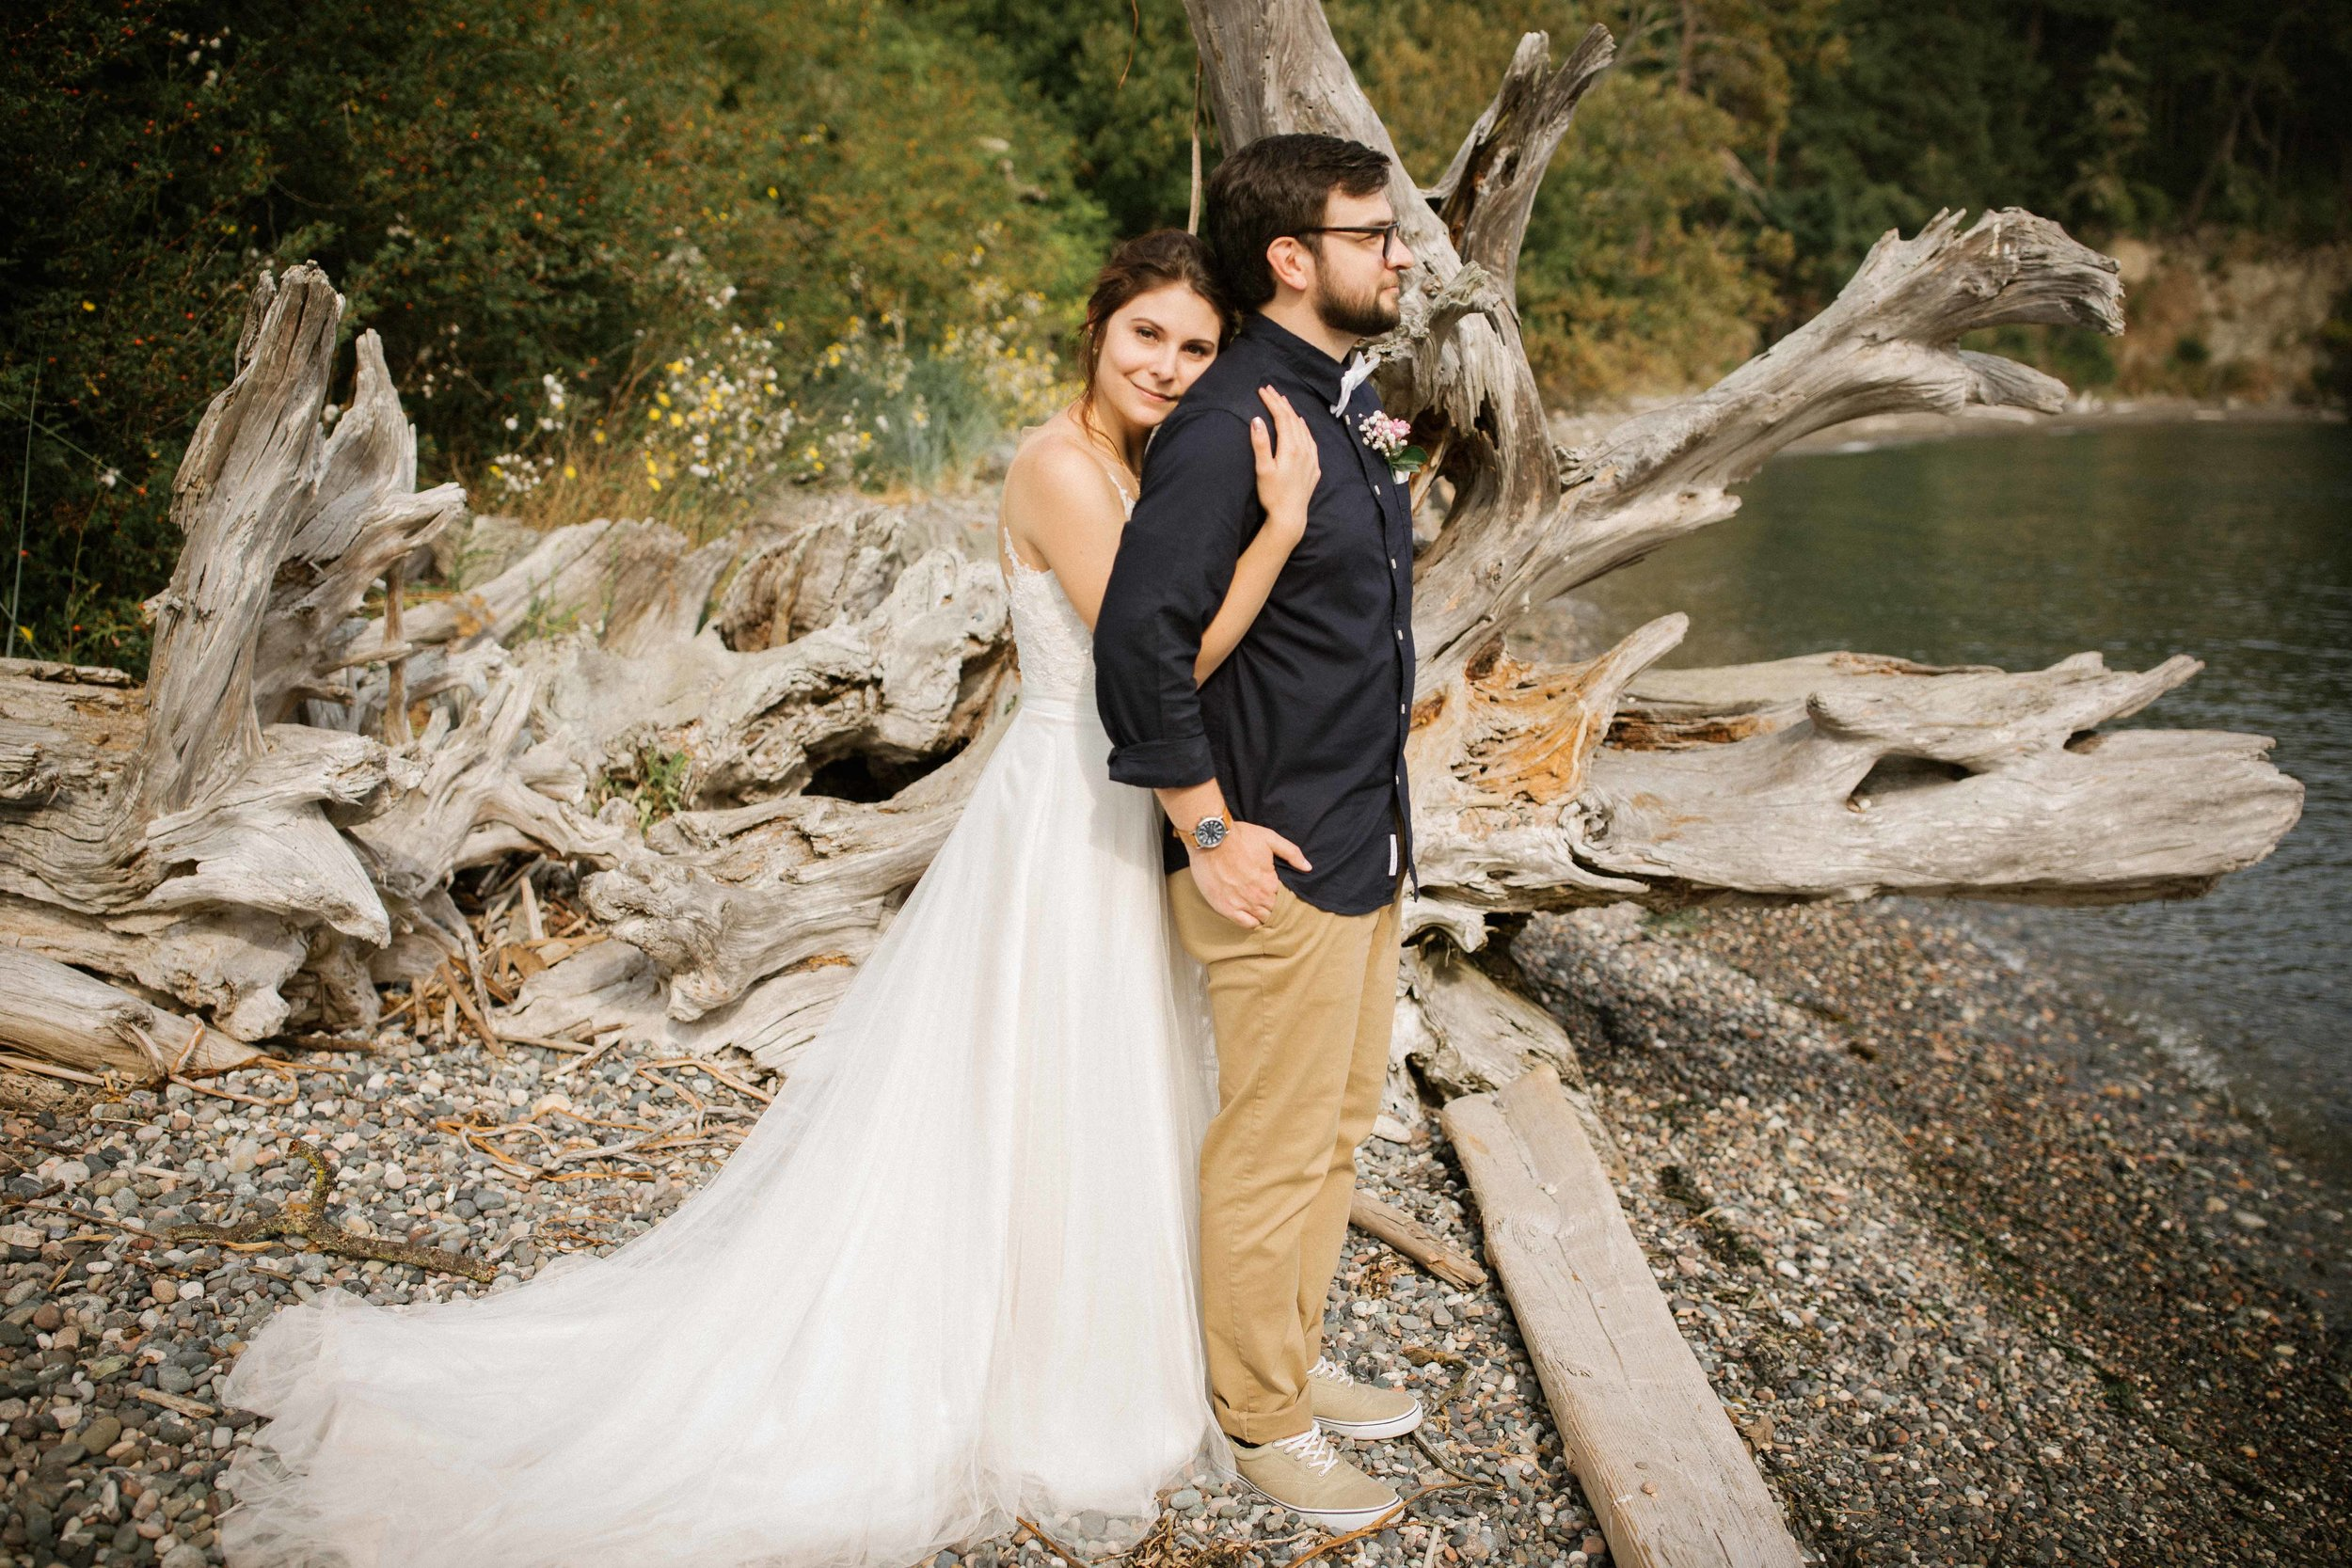 deception-pass-wedding-56.jpg